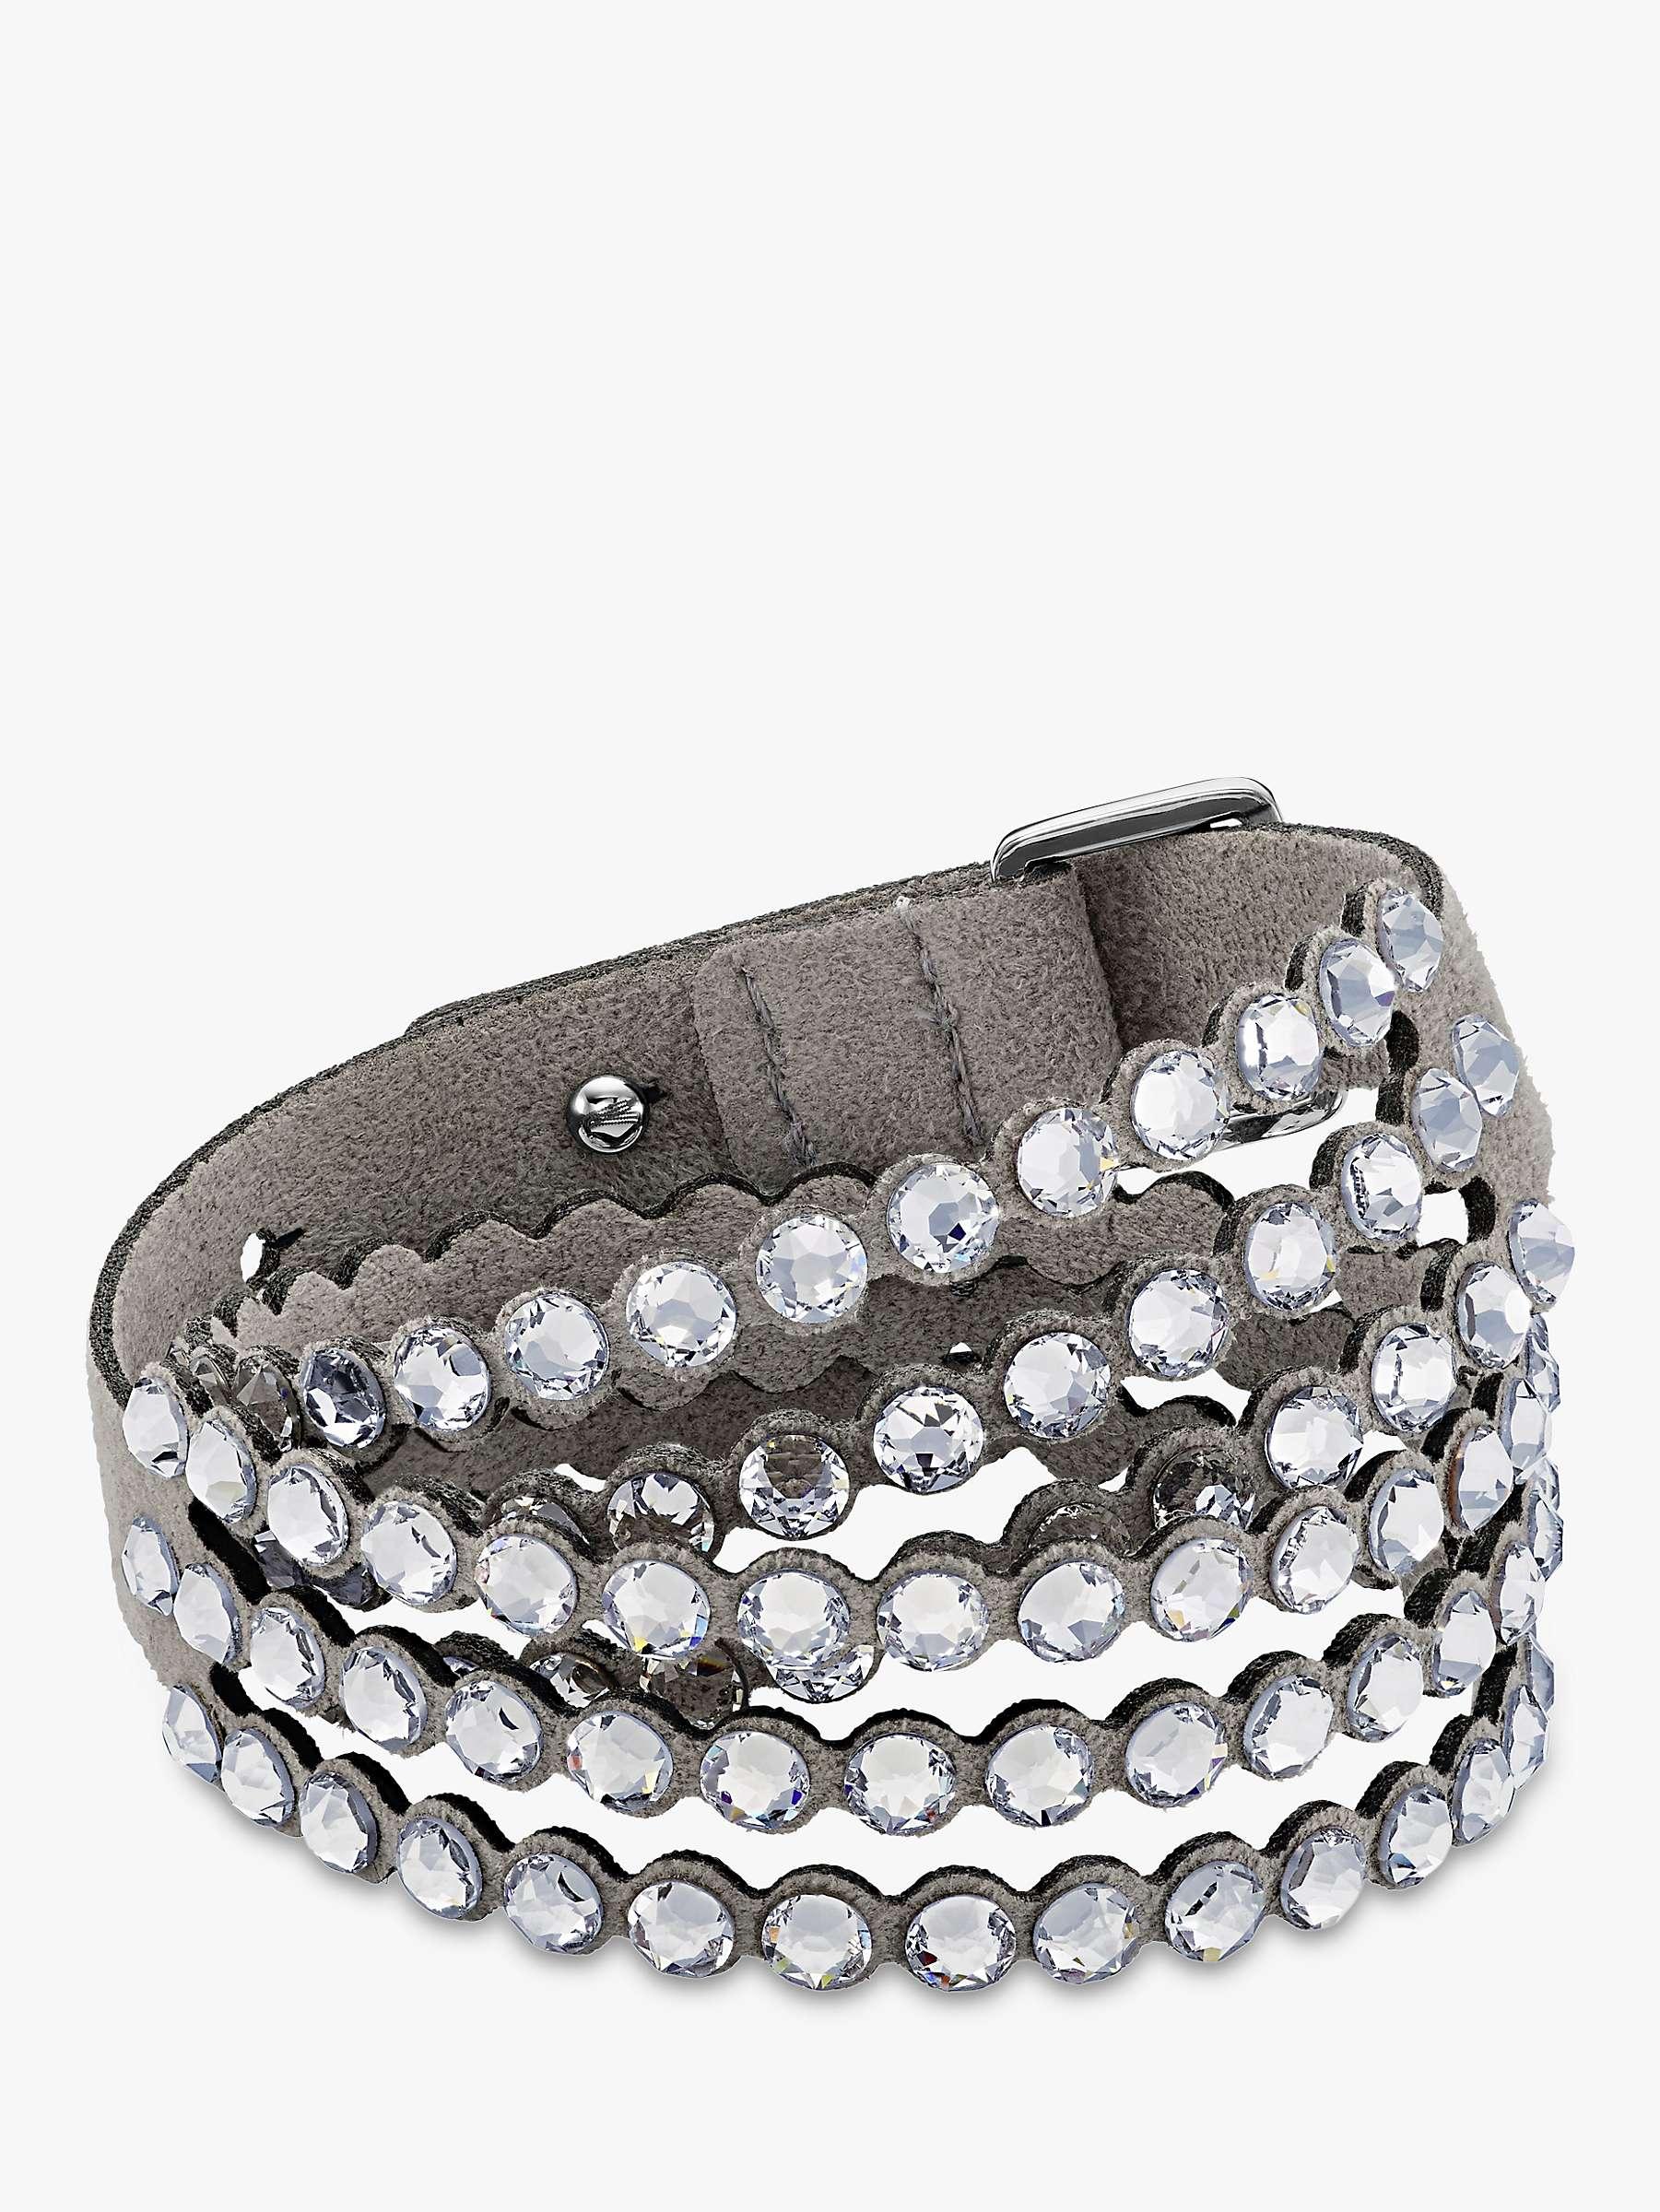 Swarovski Crystal Leather Wrap Bracelet Grey At John Lewis